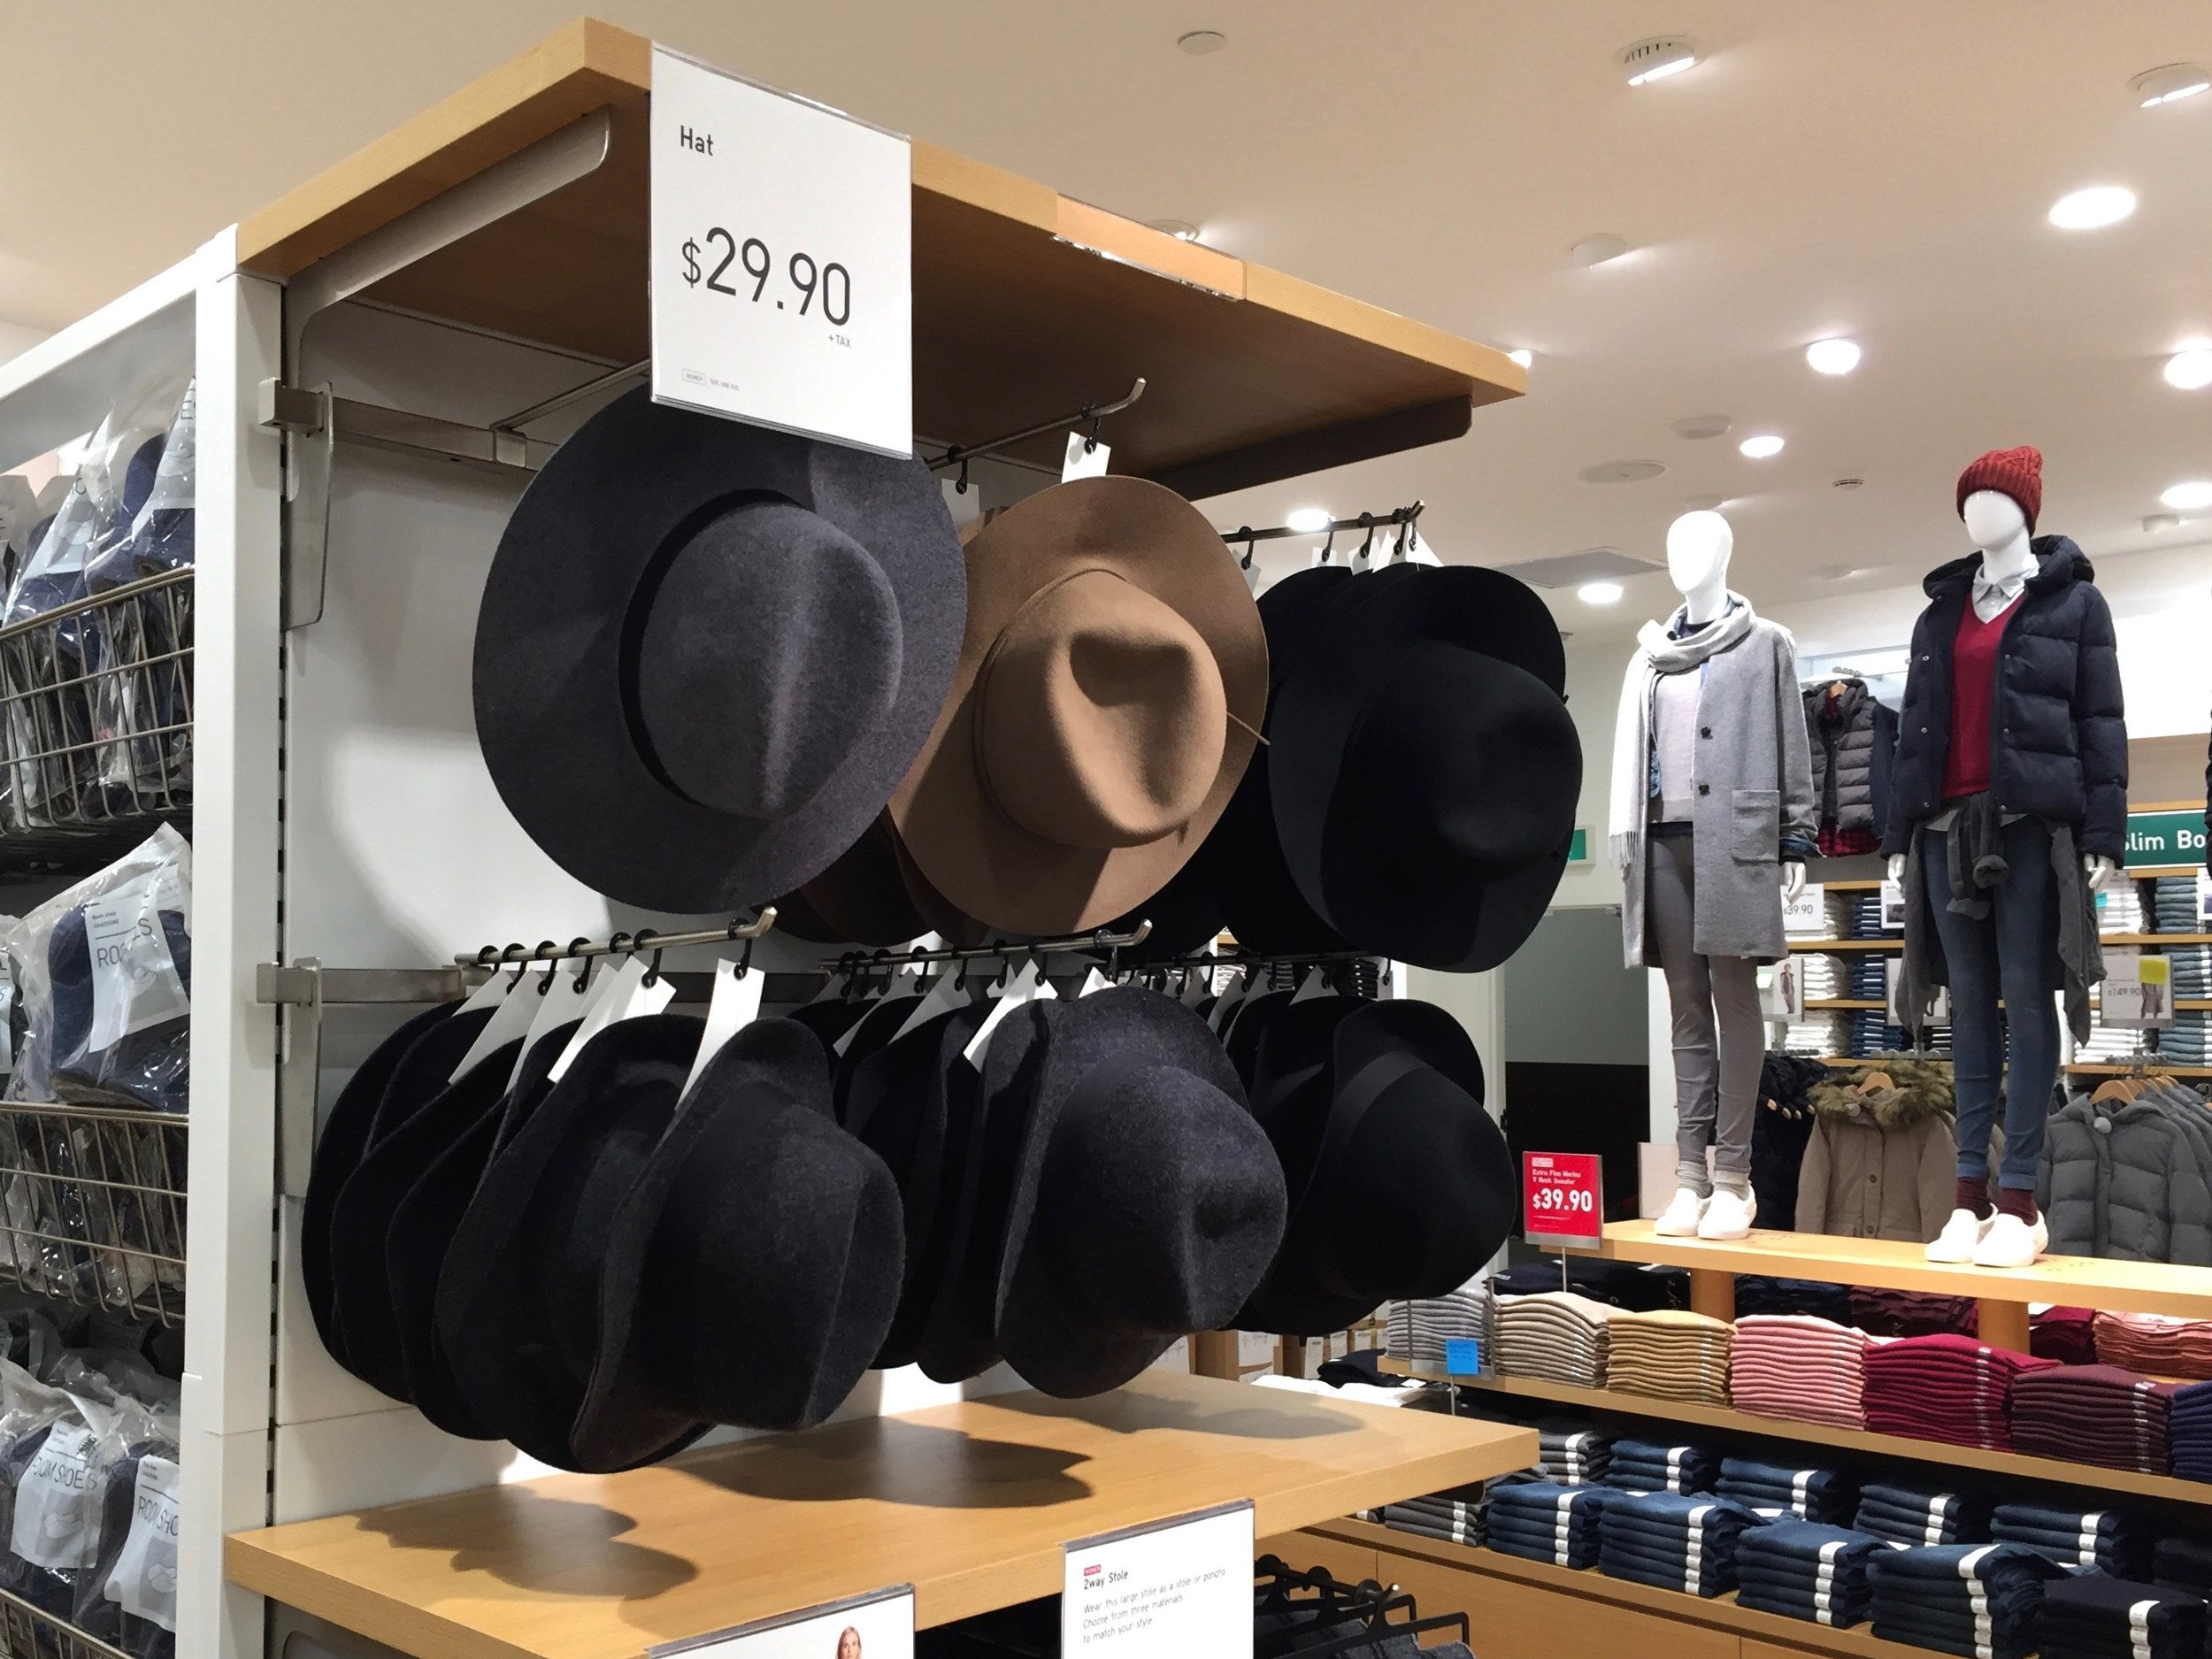 Hats, underwear, and socks are found on the second floor.Photo: Devon Johnson